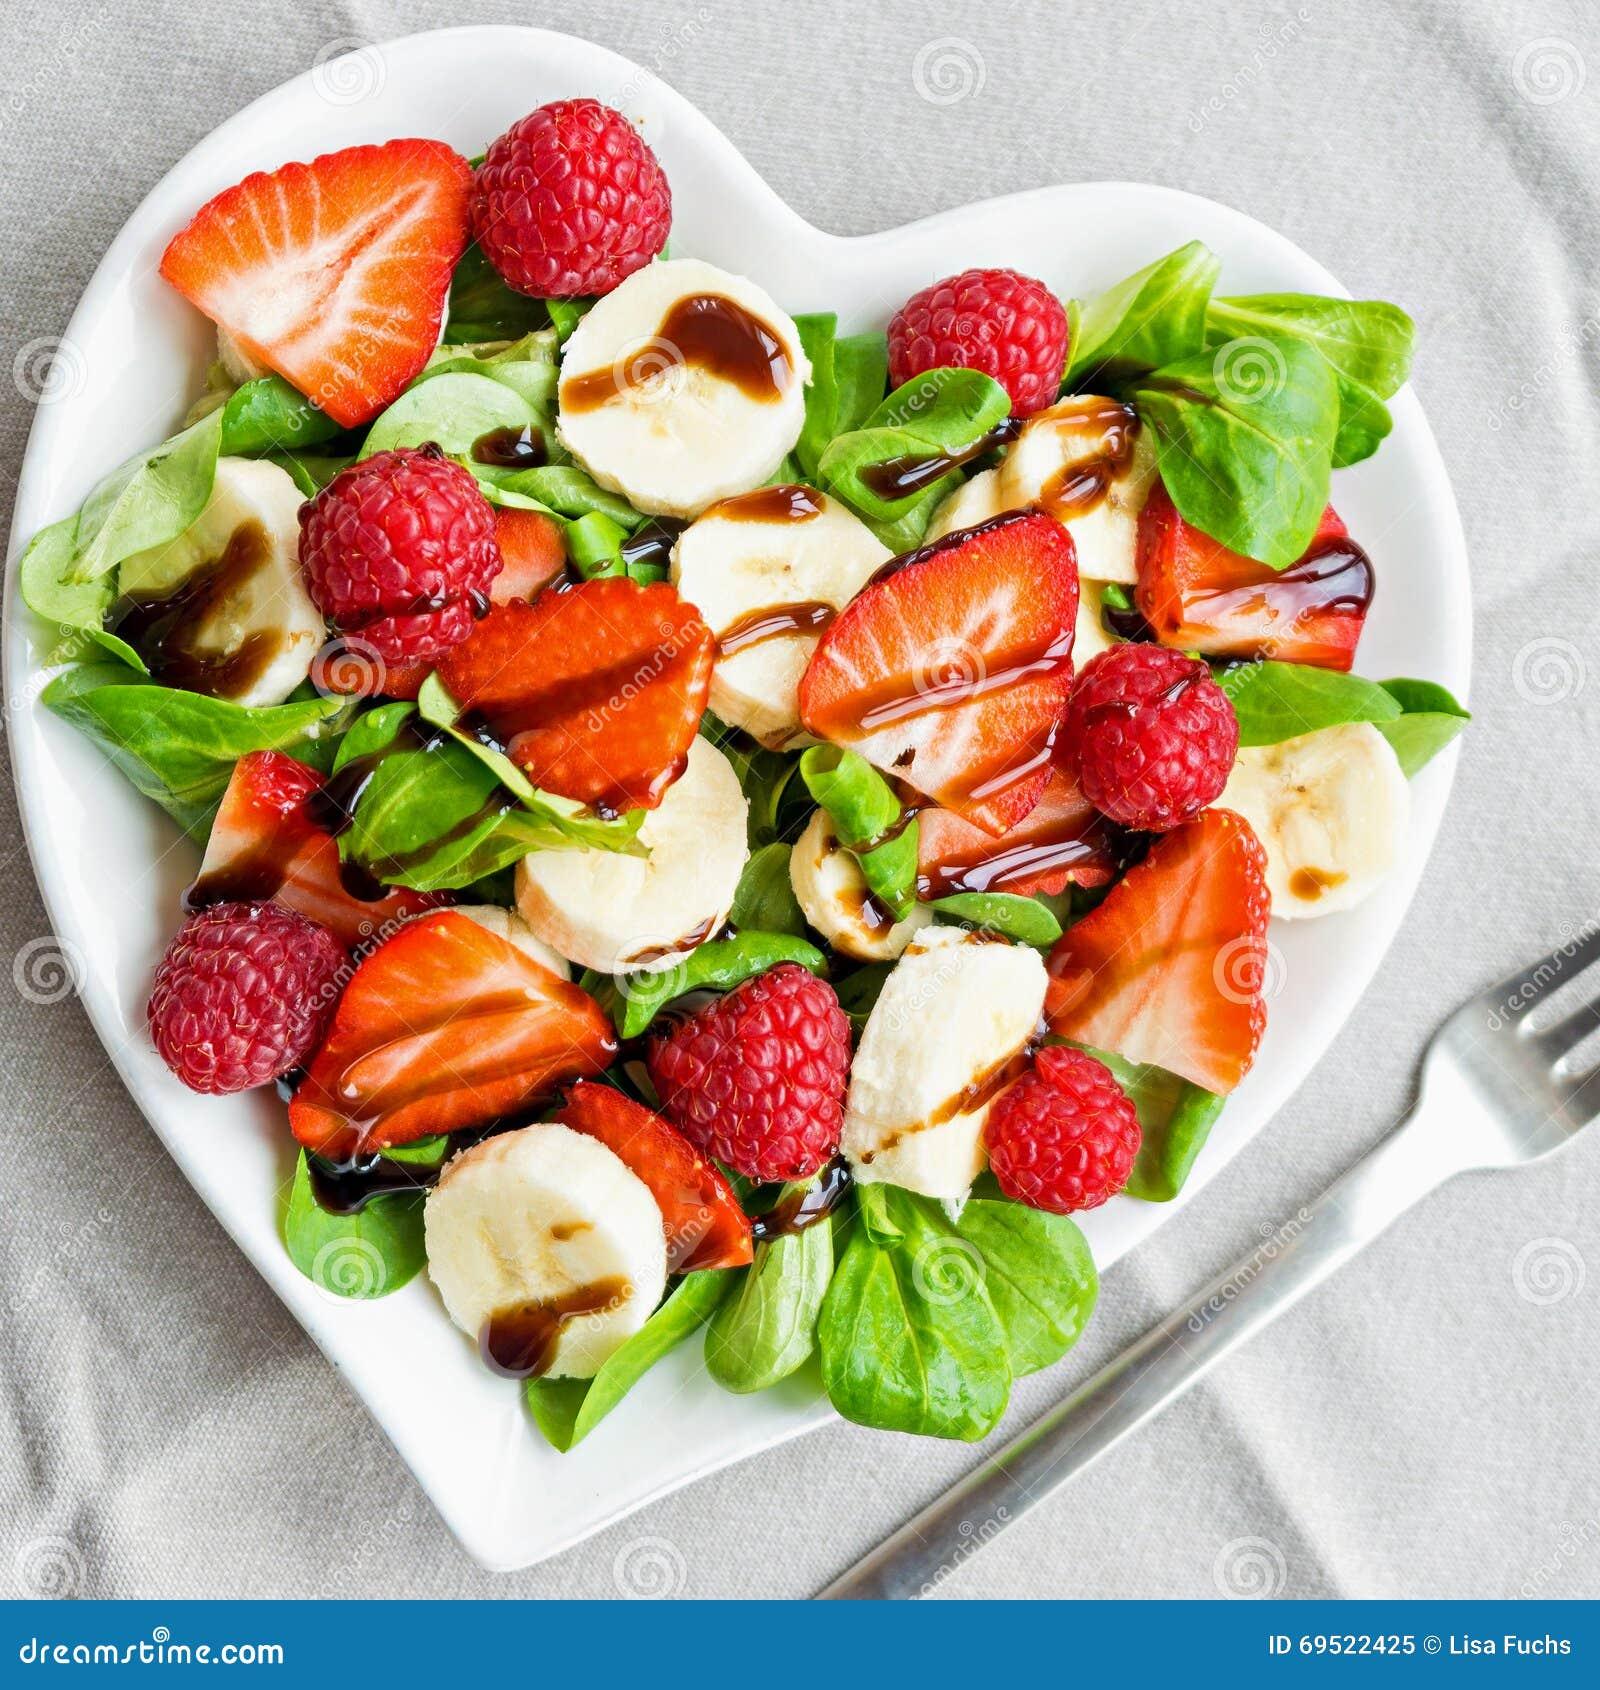 Fruit salad with salad greens